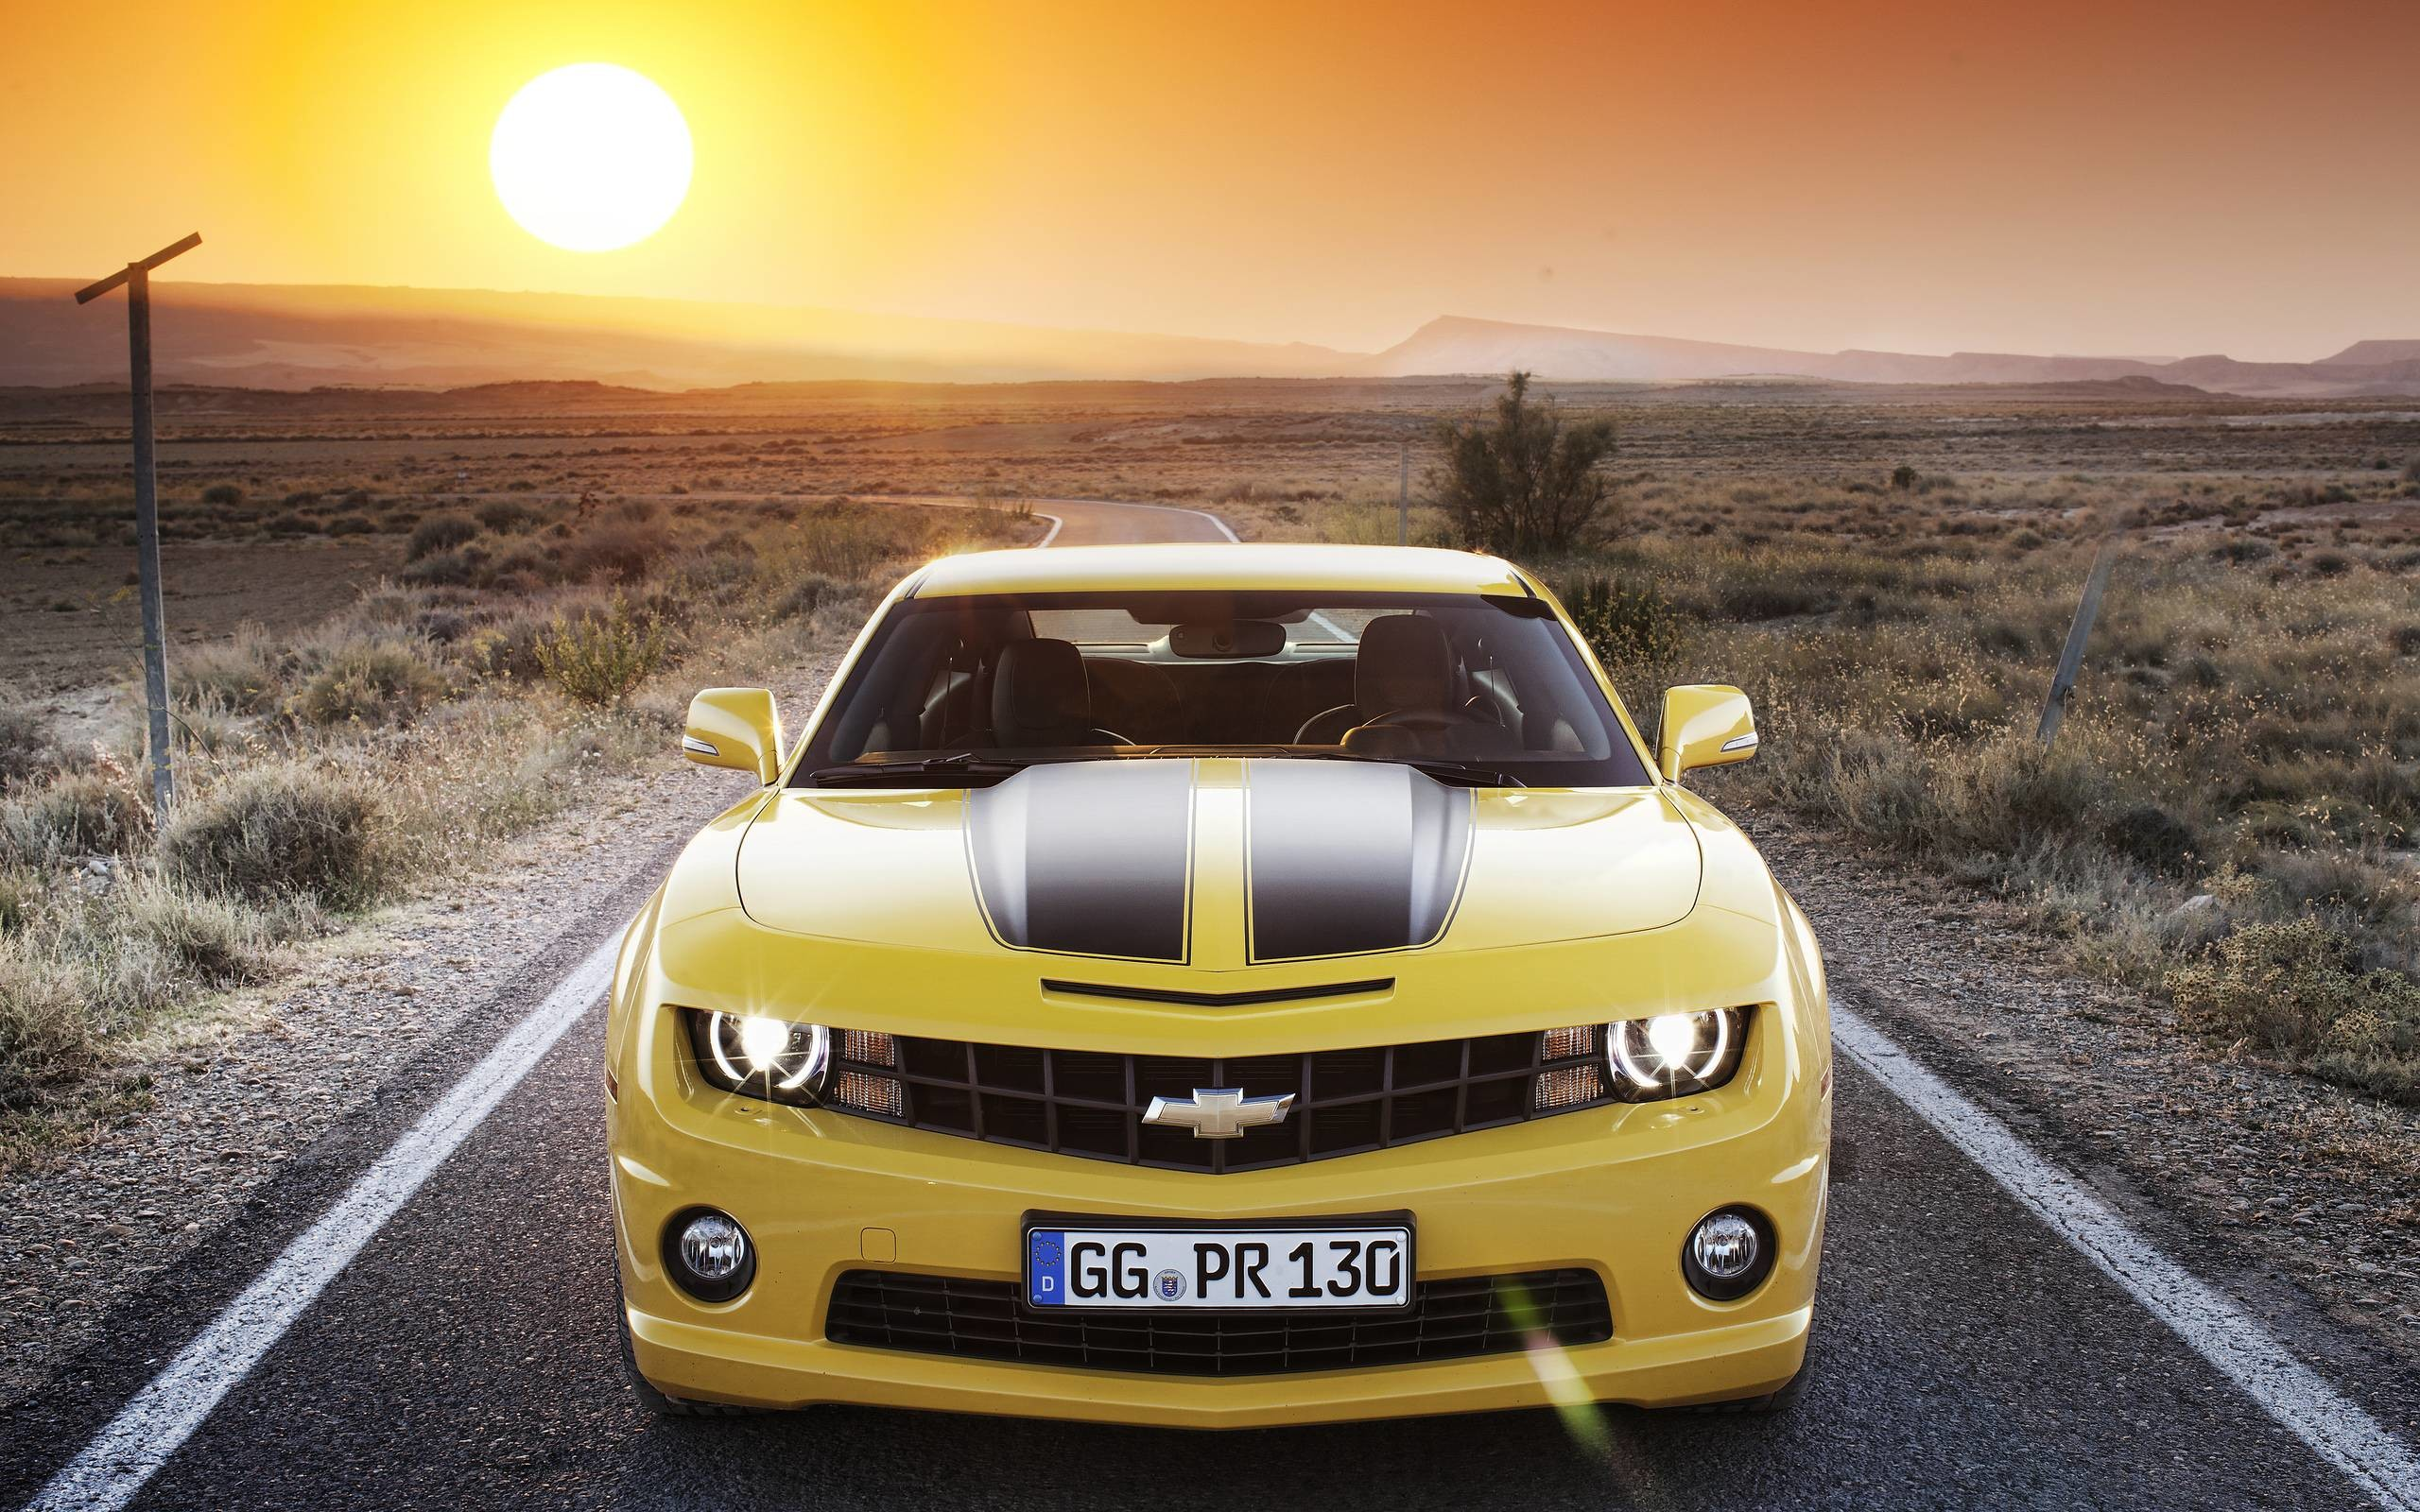 Chevrolet Camaro Wallpaper Yellow 2652 Full HD Wallpaper Desktop .